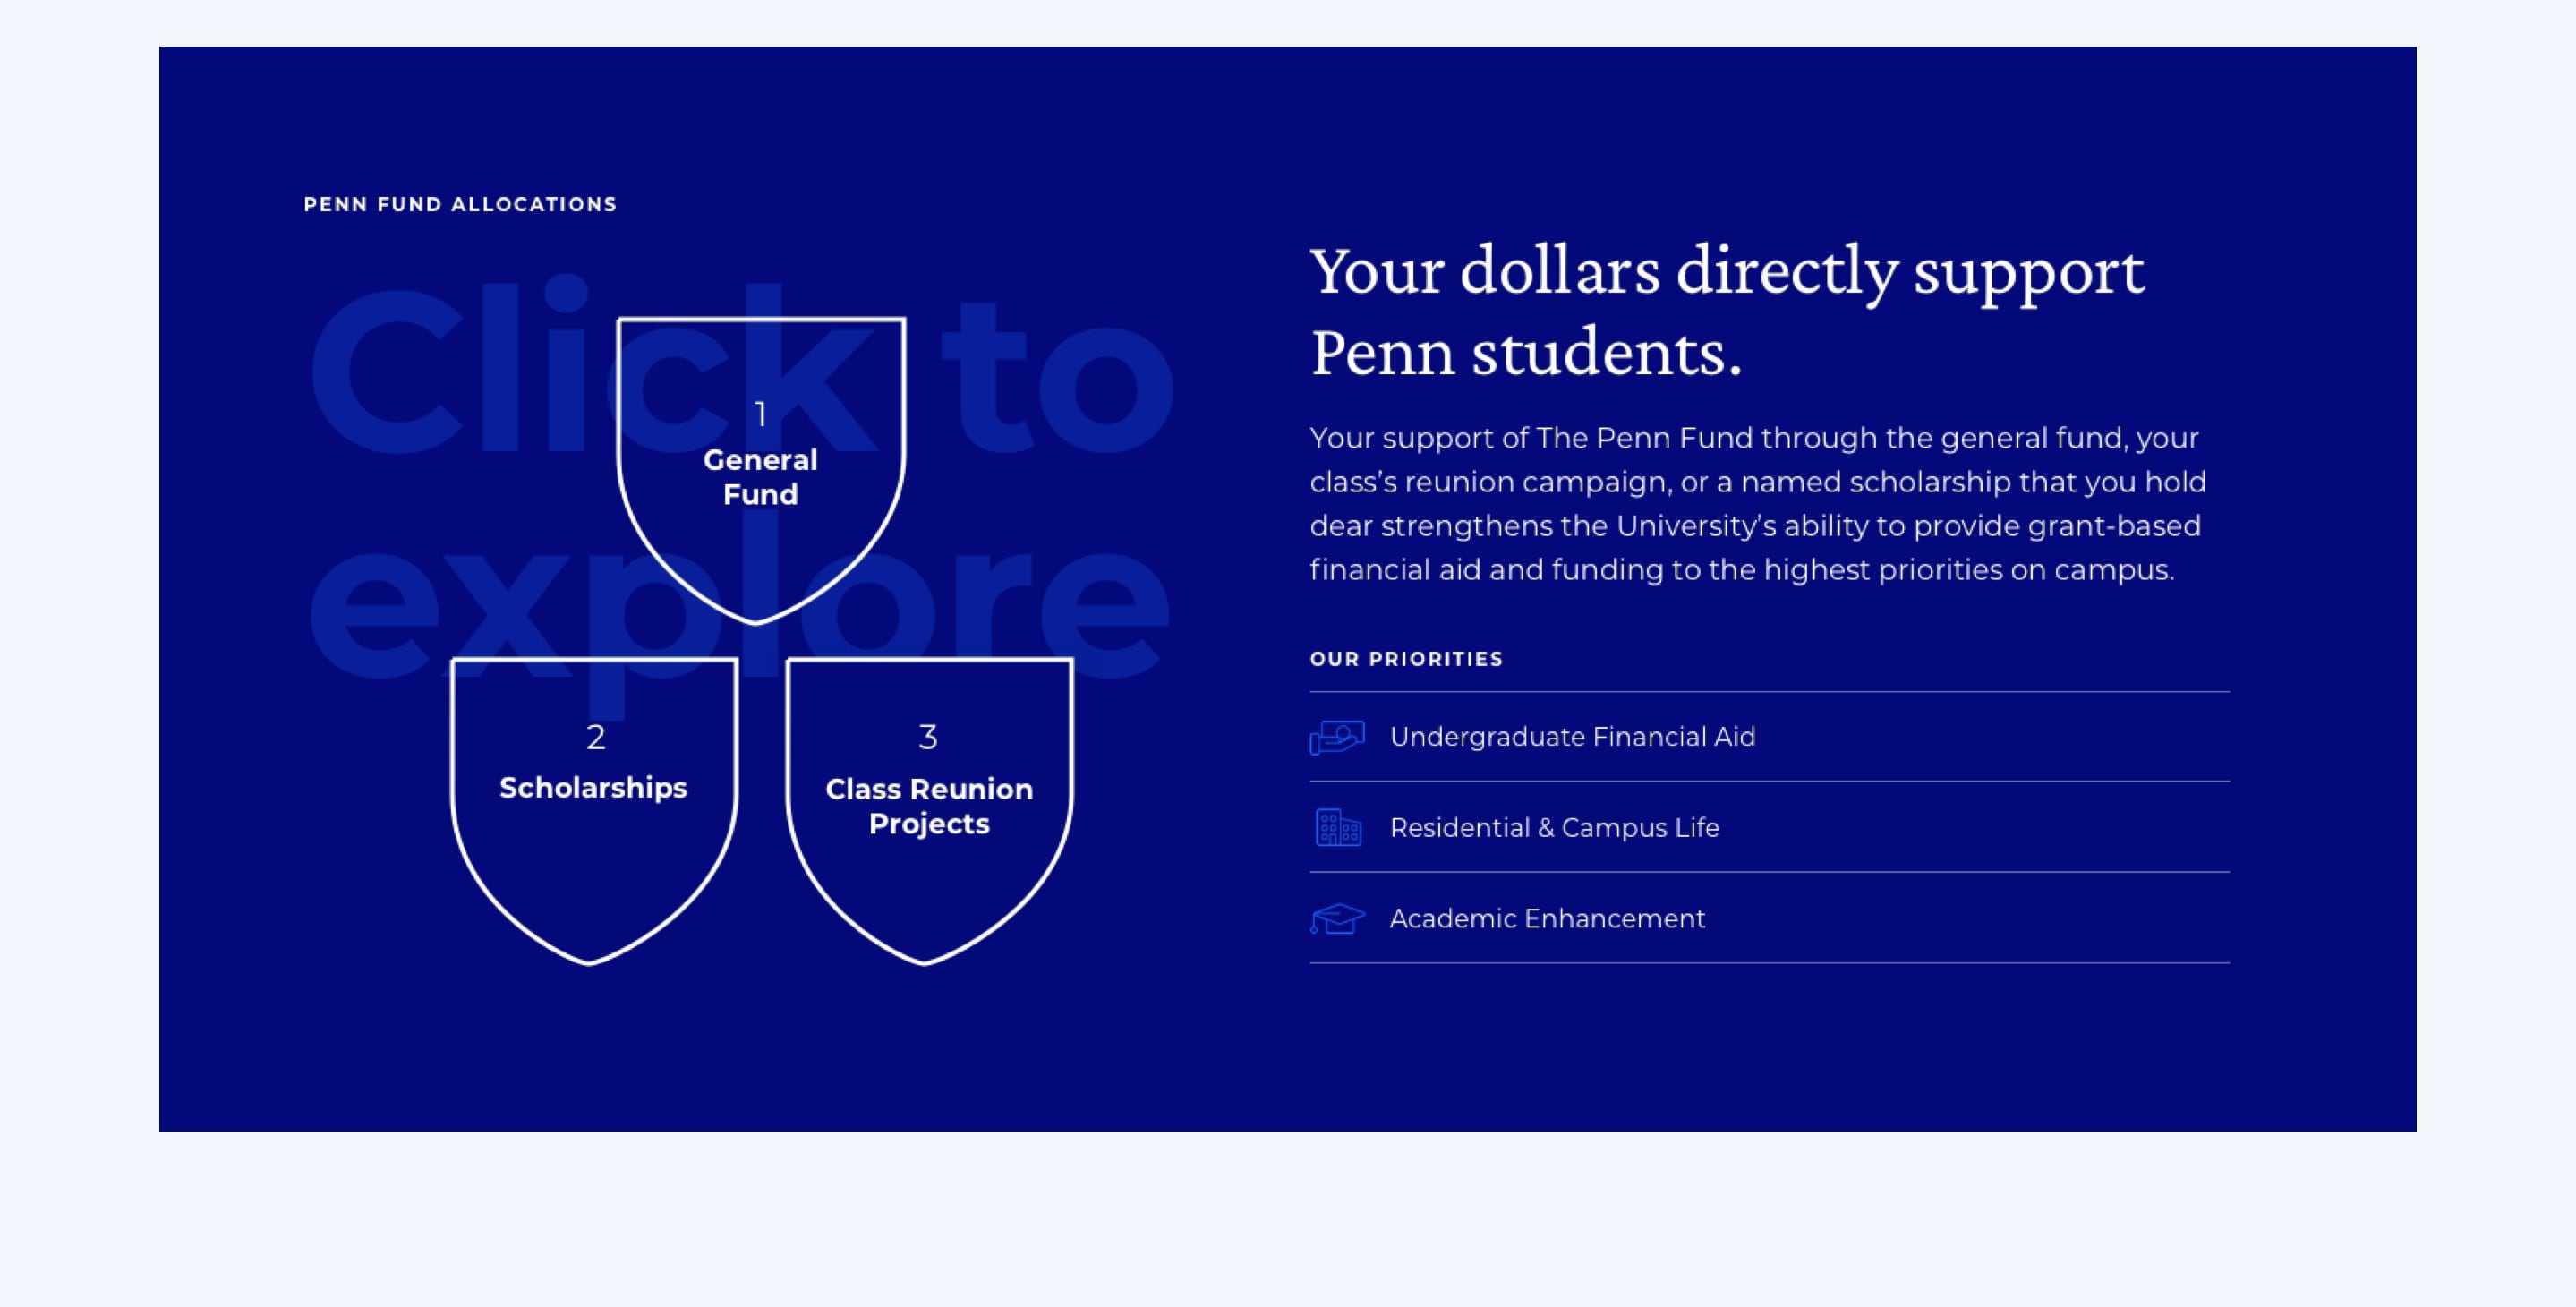 Penn fund allocations fullwidth